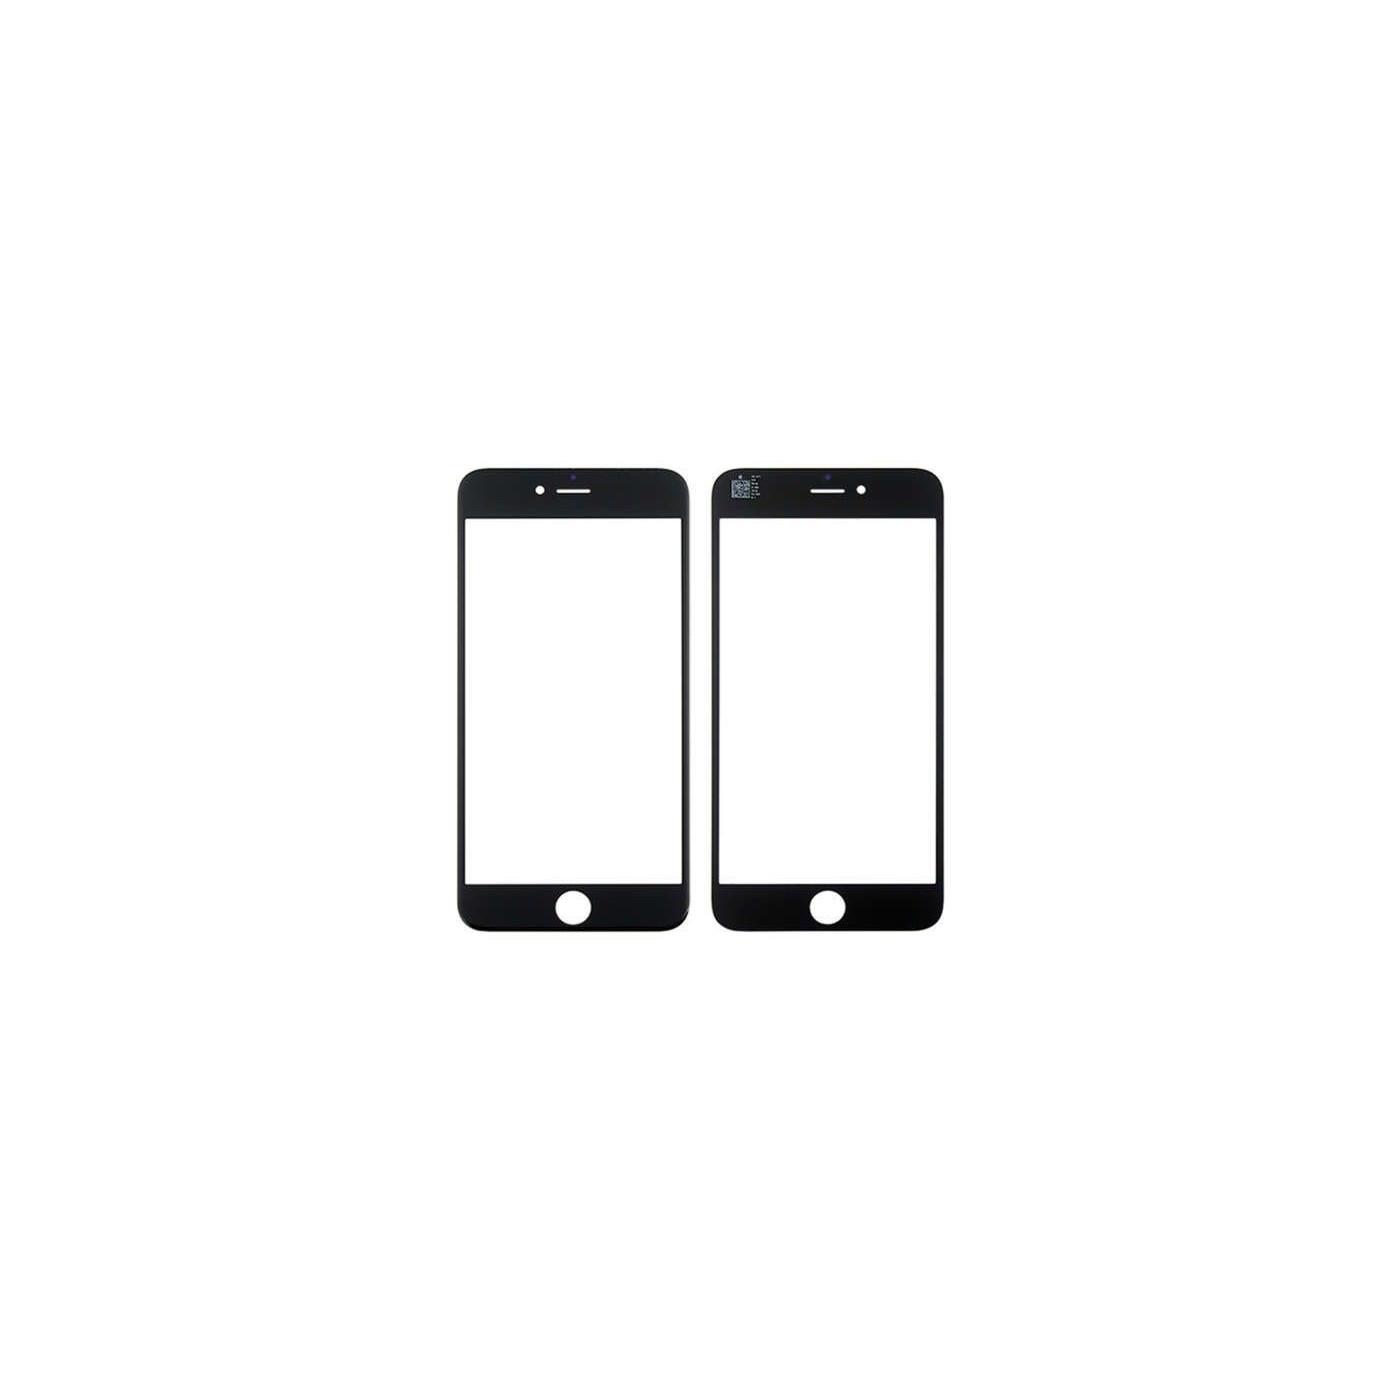 Cristal frontal de vidrio para iPhone 6 Plus - Pantalla táctil negra 6s Plus